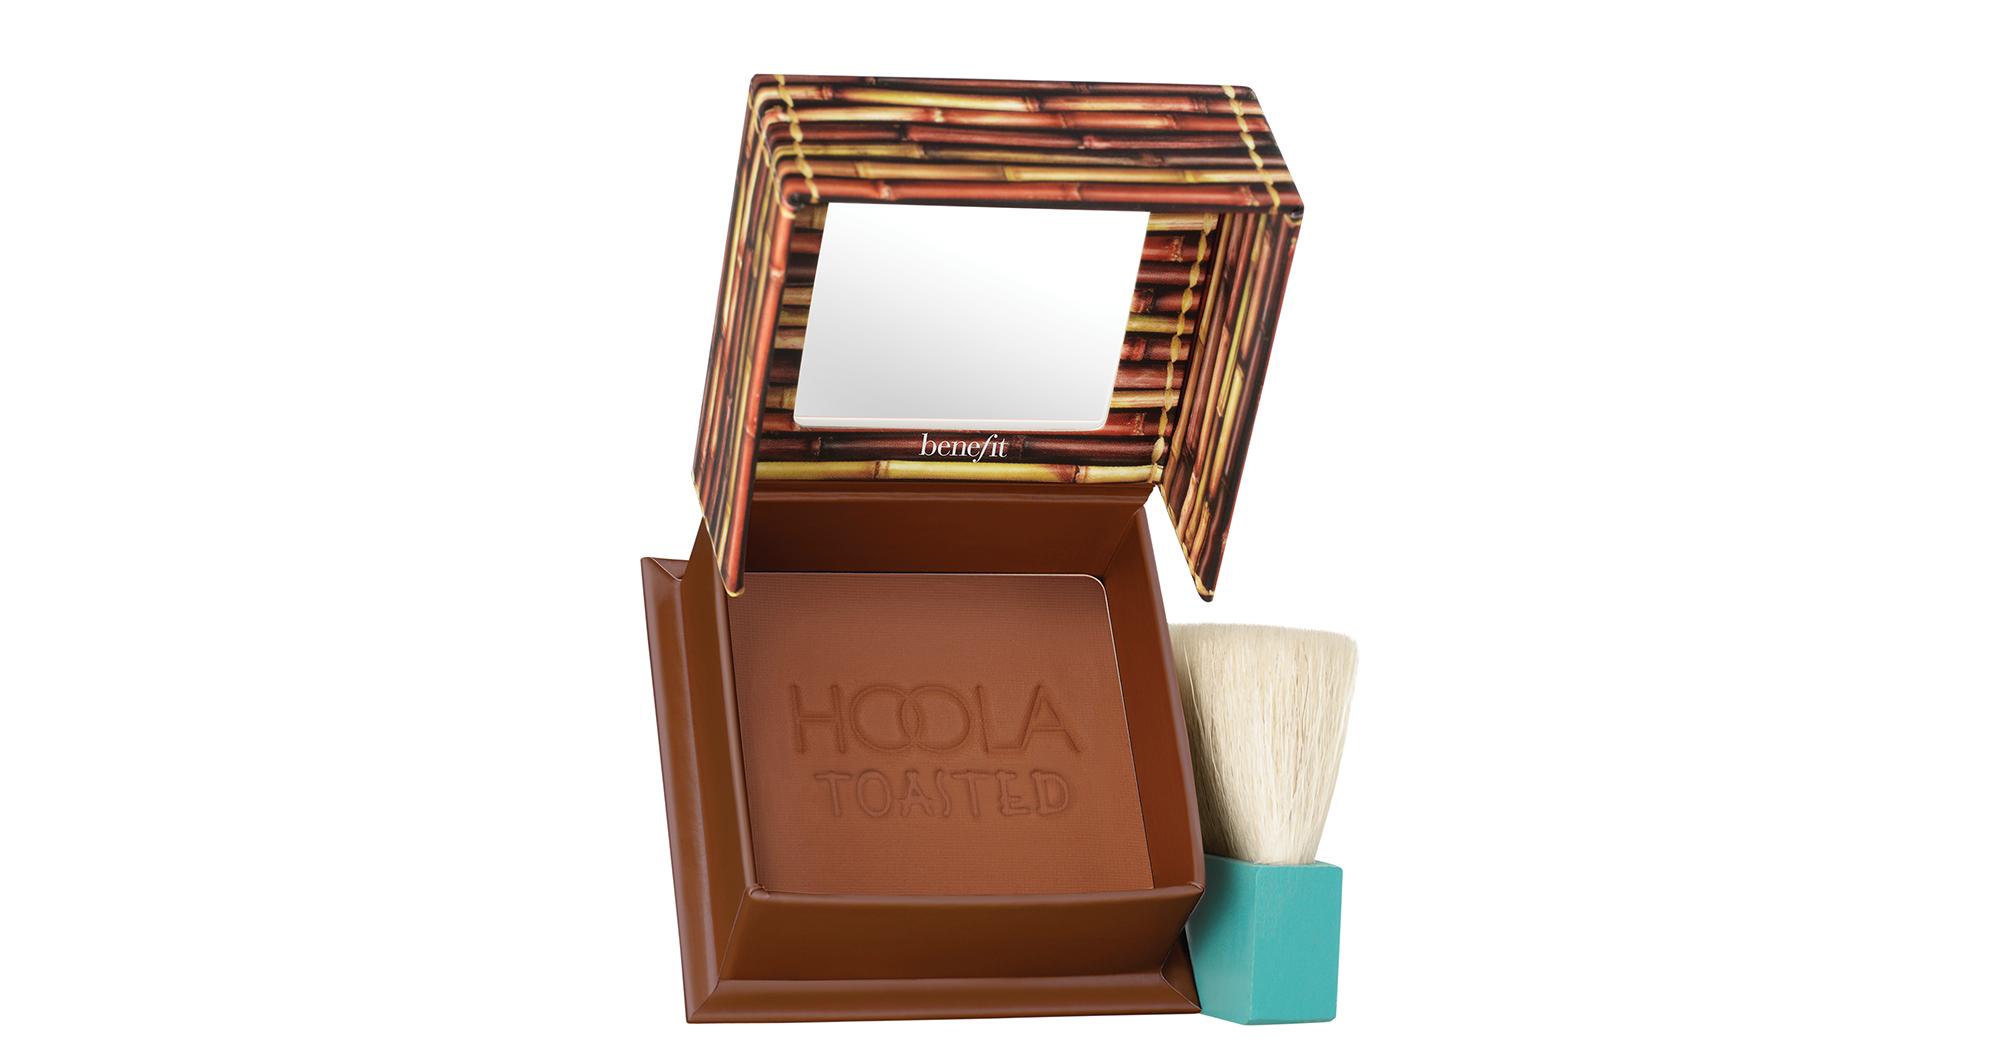 We Tried The New Darker Shades Of Benefit's Hoola Bronzer — & They're Legit